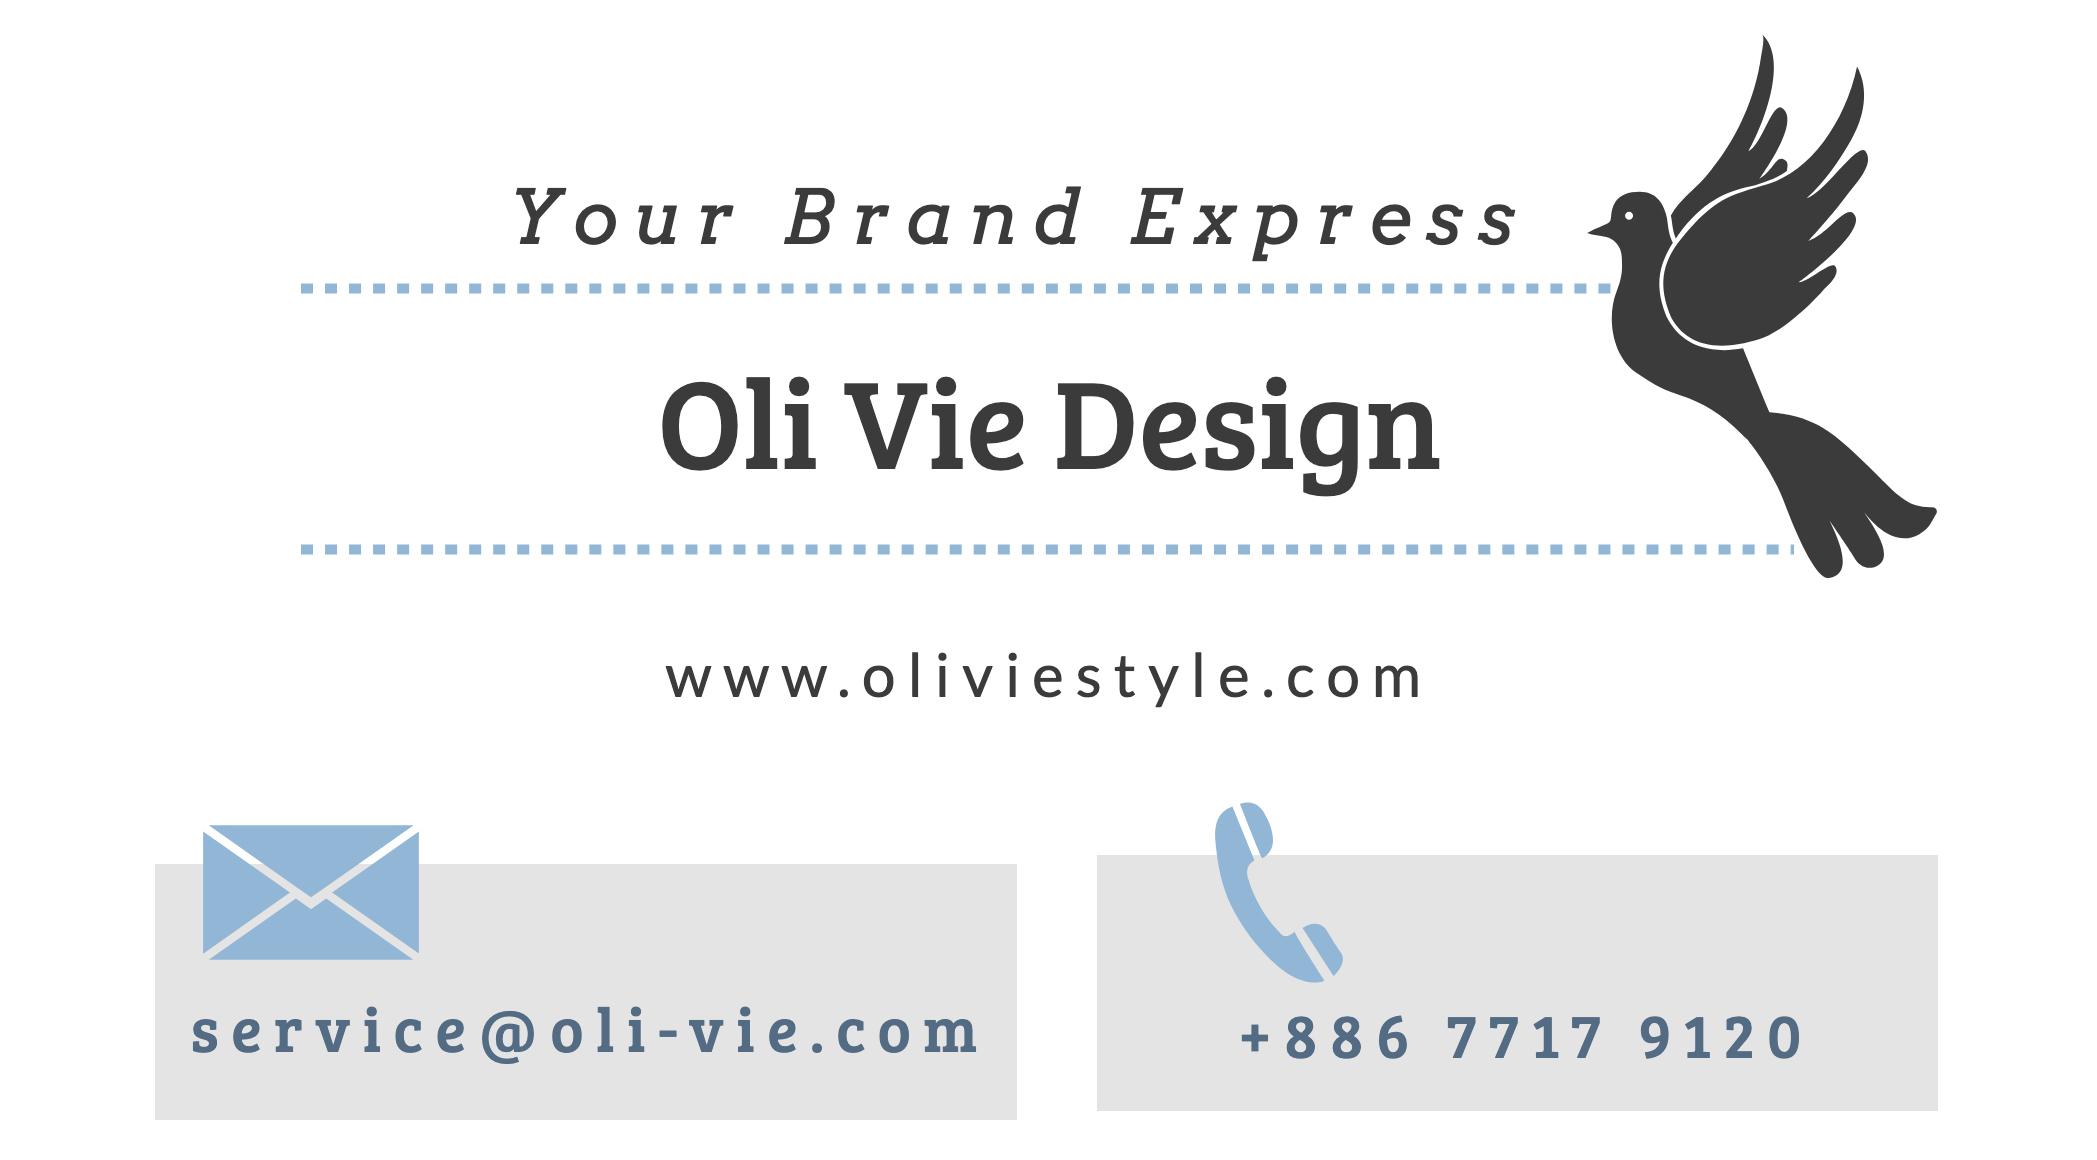 Oli Vie Design,歐妞設計,行謙生活,平面設計,商業設計,影片製作,拍影片,平面拍攝,拍產品,產品設計,包裝設計,LOGO設計,DM設計,網頁設計,印刷輸出,展場設計,線下活動,後製,網紅,口碑行銷,KOL,SEO,找小編,社群經營